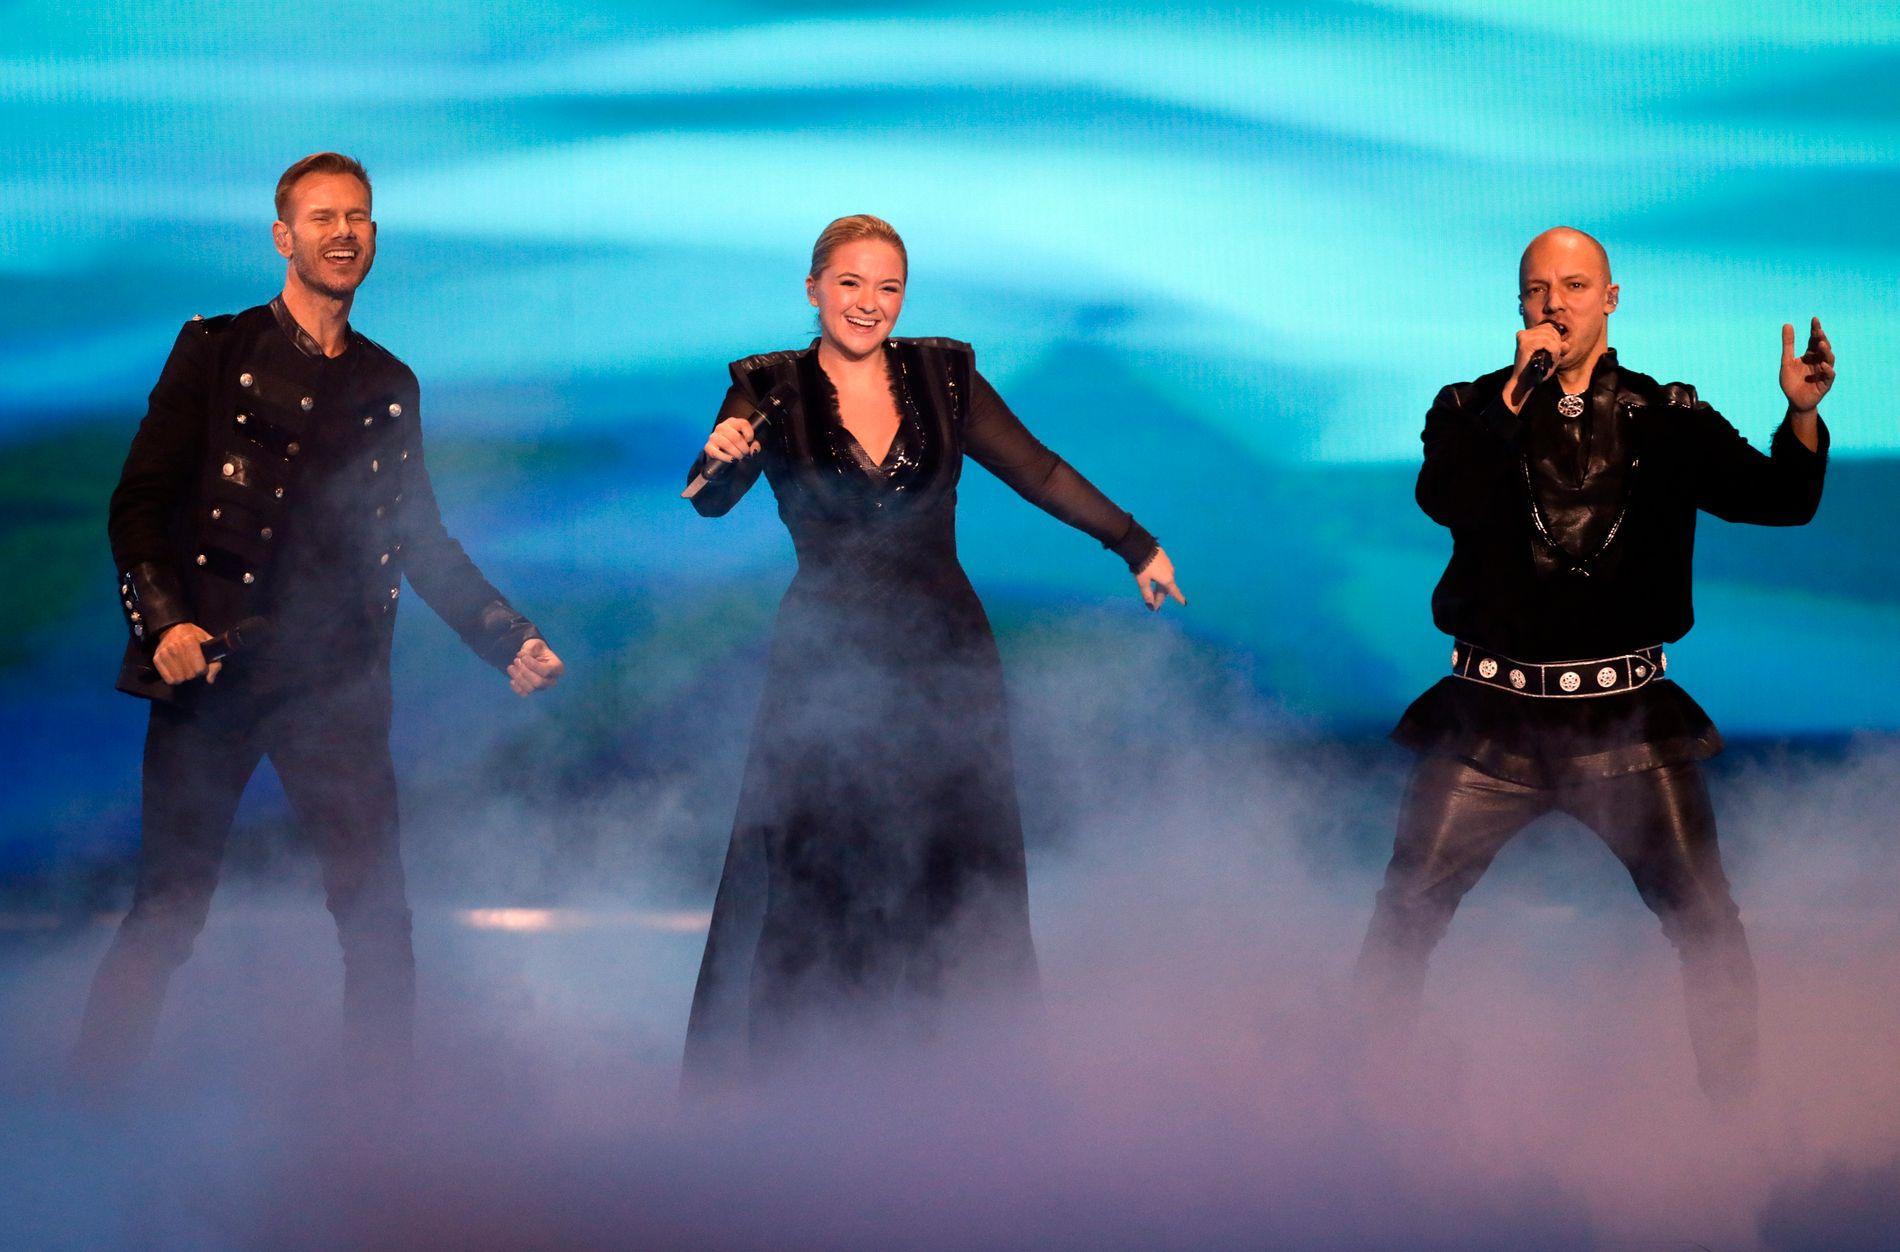 KEiiNO: Norge kom på en femteplass i Eurovision song contest.